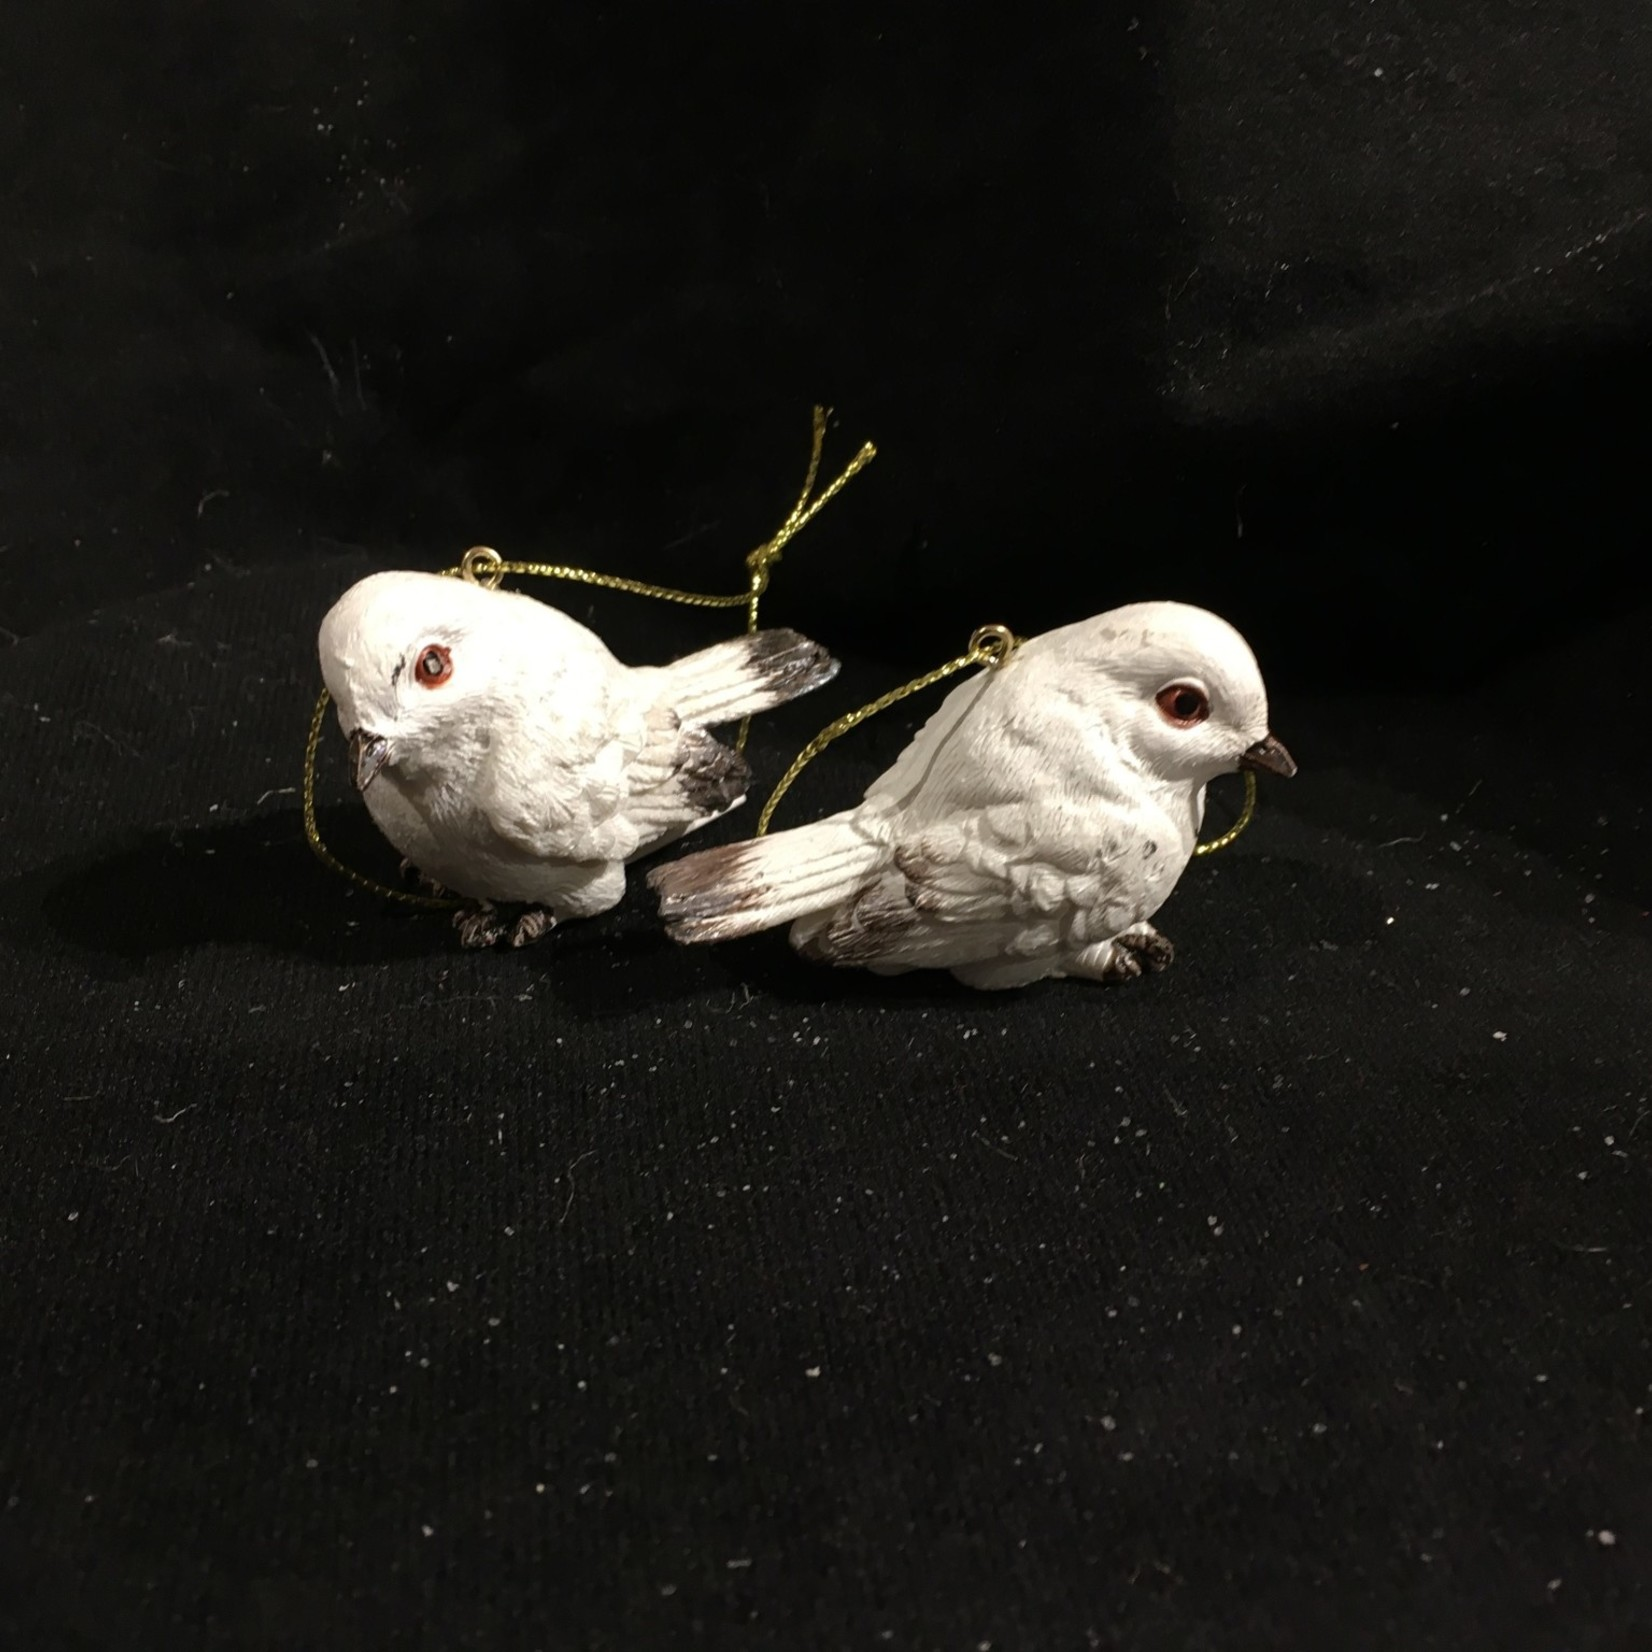 Winter White Bird Orn 4A